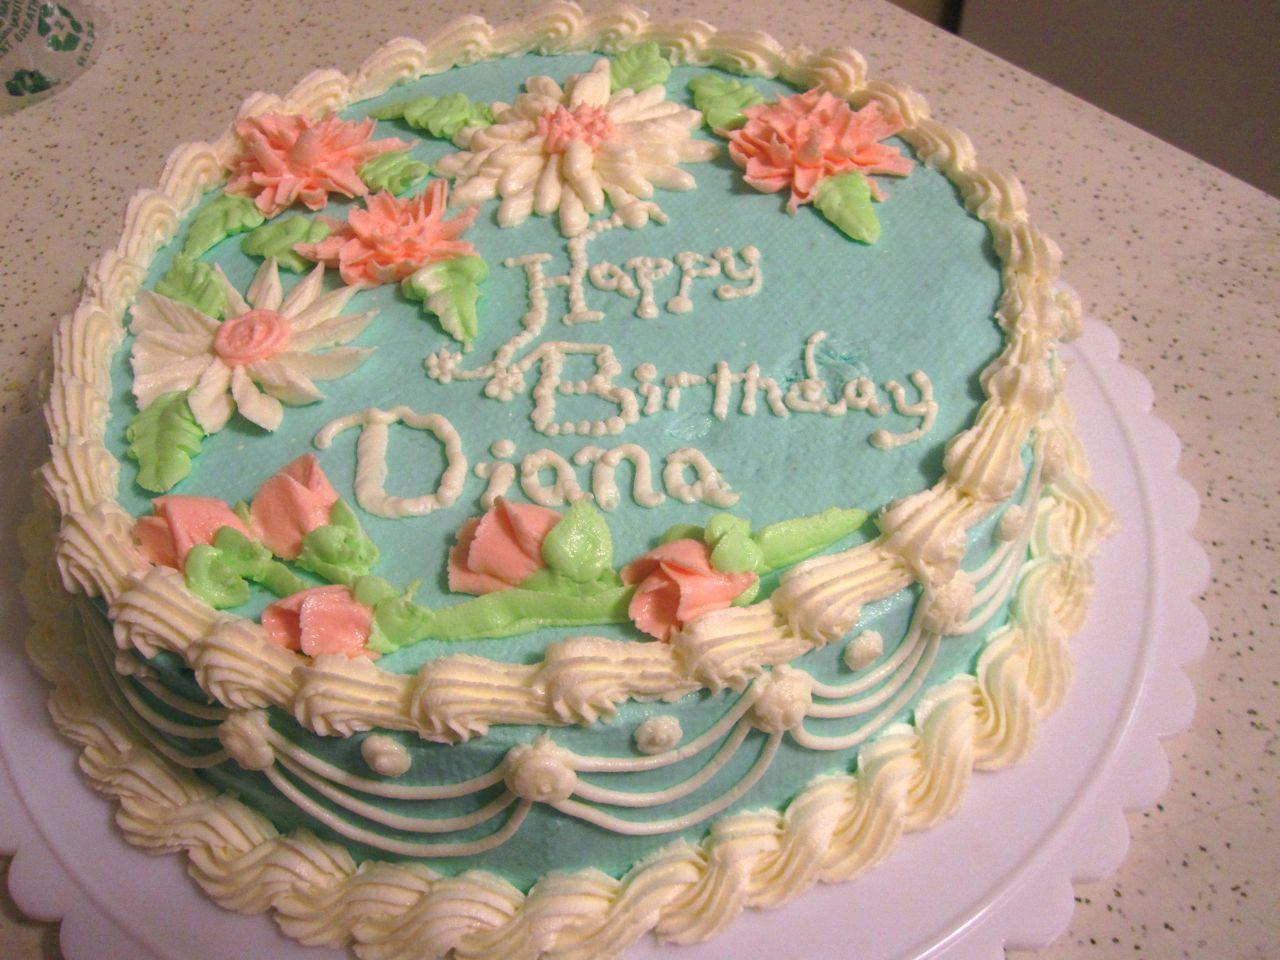 Princess Diana Birthday Cake Image Inspiration of Cake and